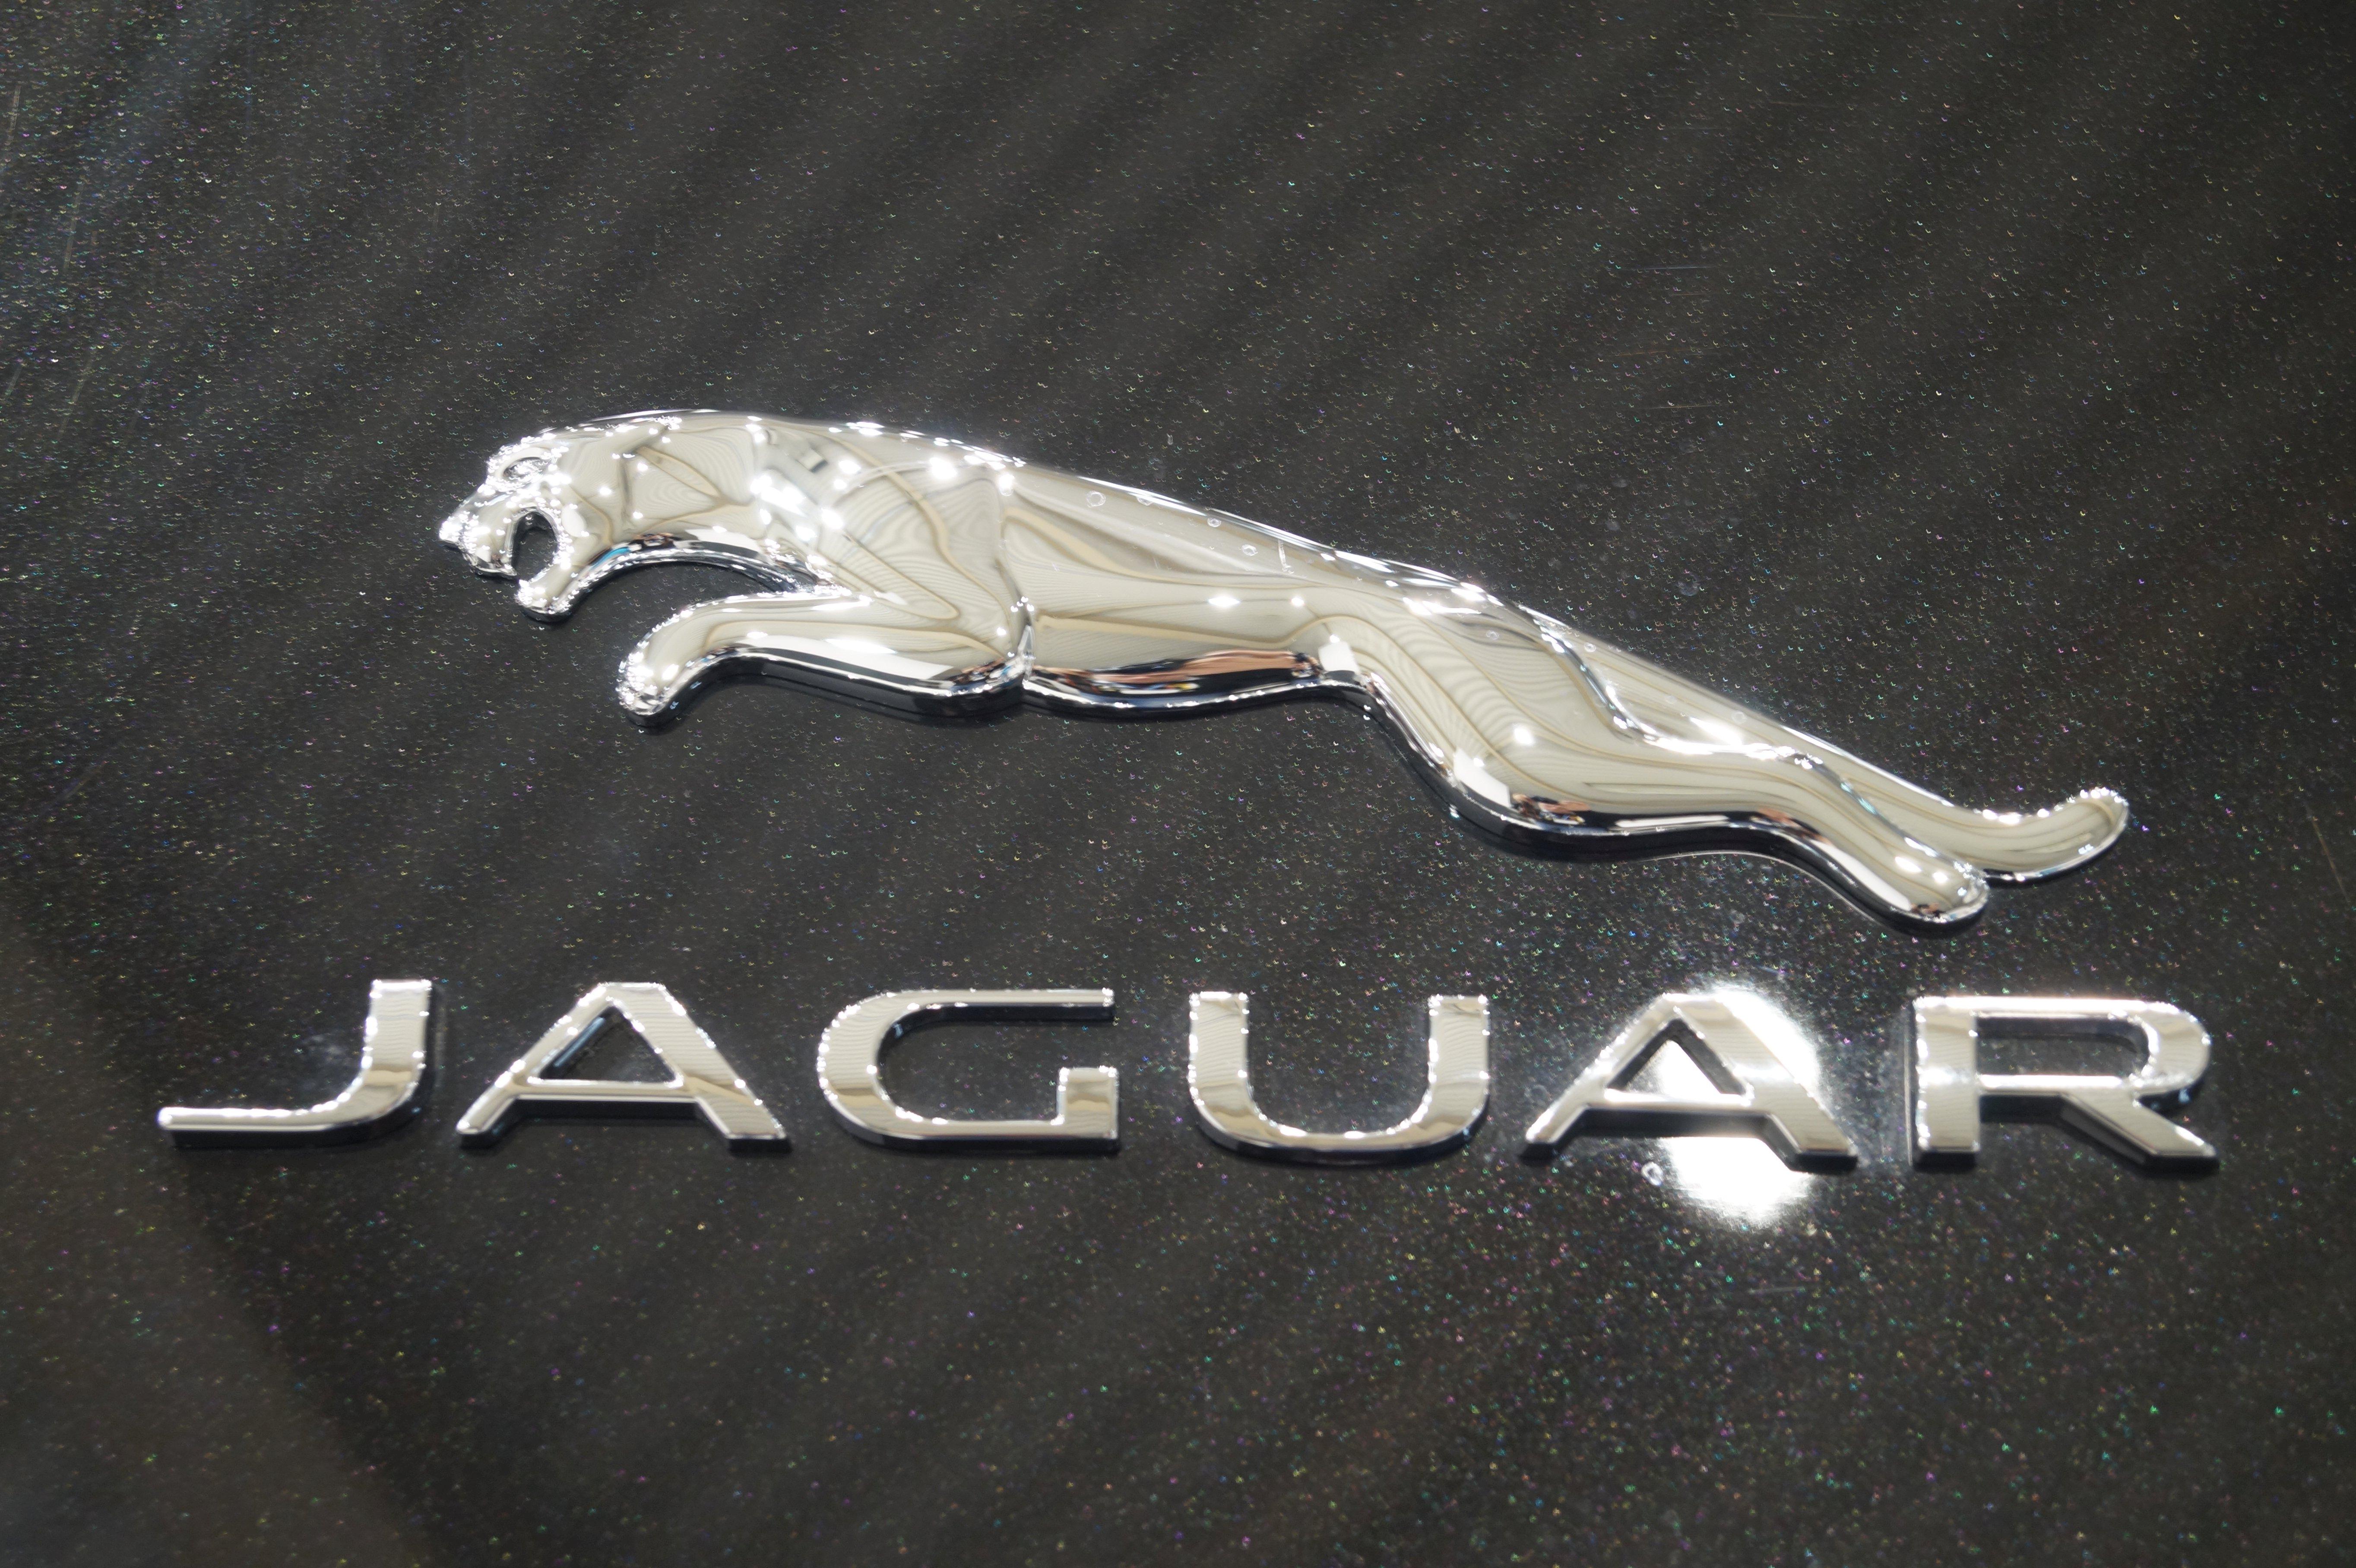 file jaguar logo msp16 jpg wikimedia commons